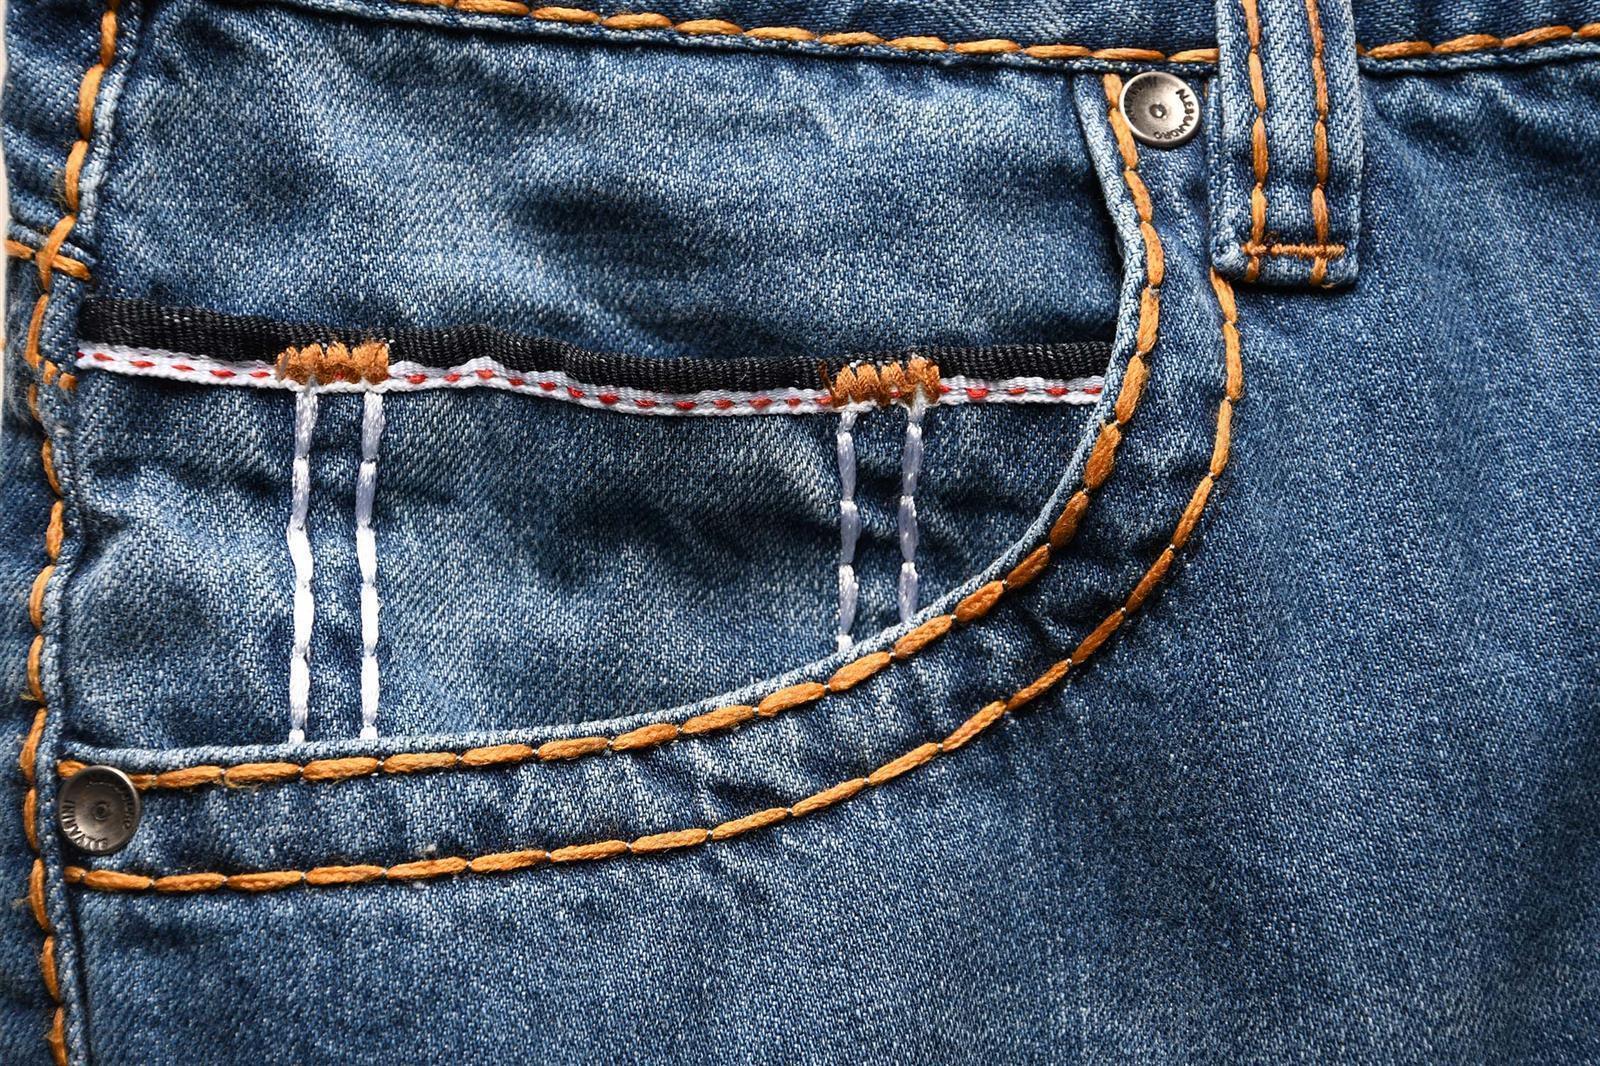 A-Salvarini-Herren-Jeans-Hose-dicke-Naehte-Jeanshose-Comfort-Fit-gerades-Bein Indexbild 16